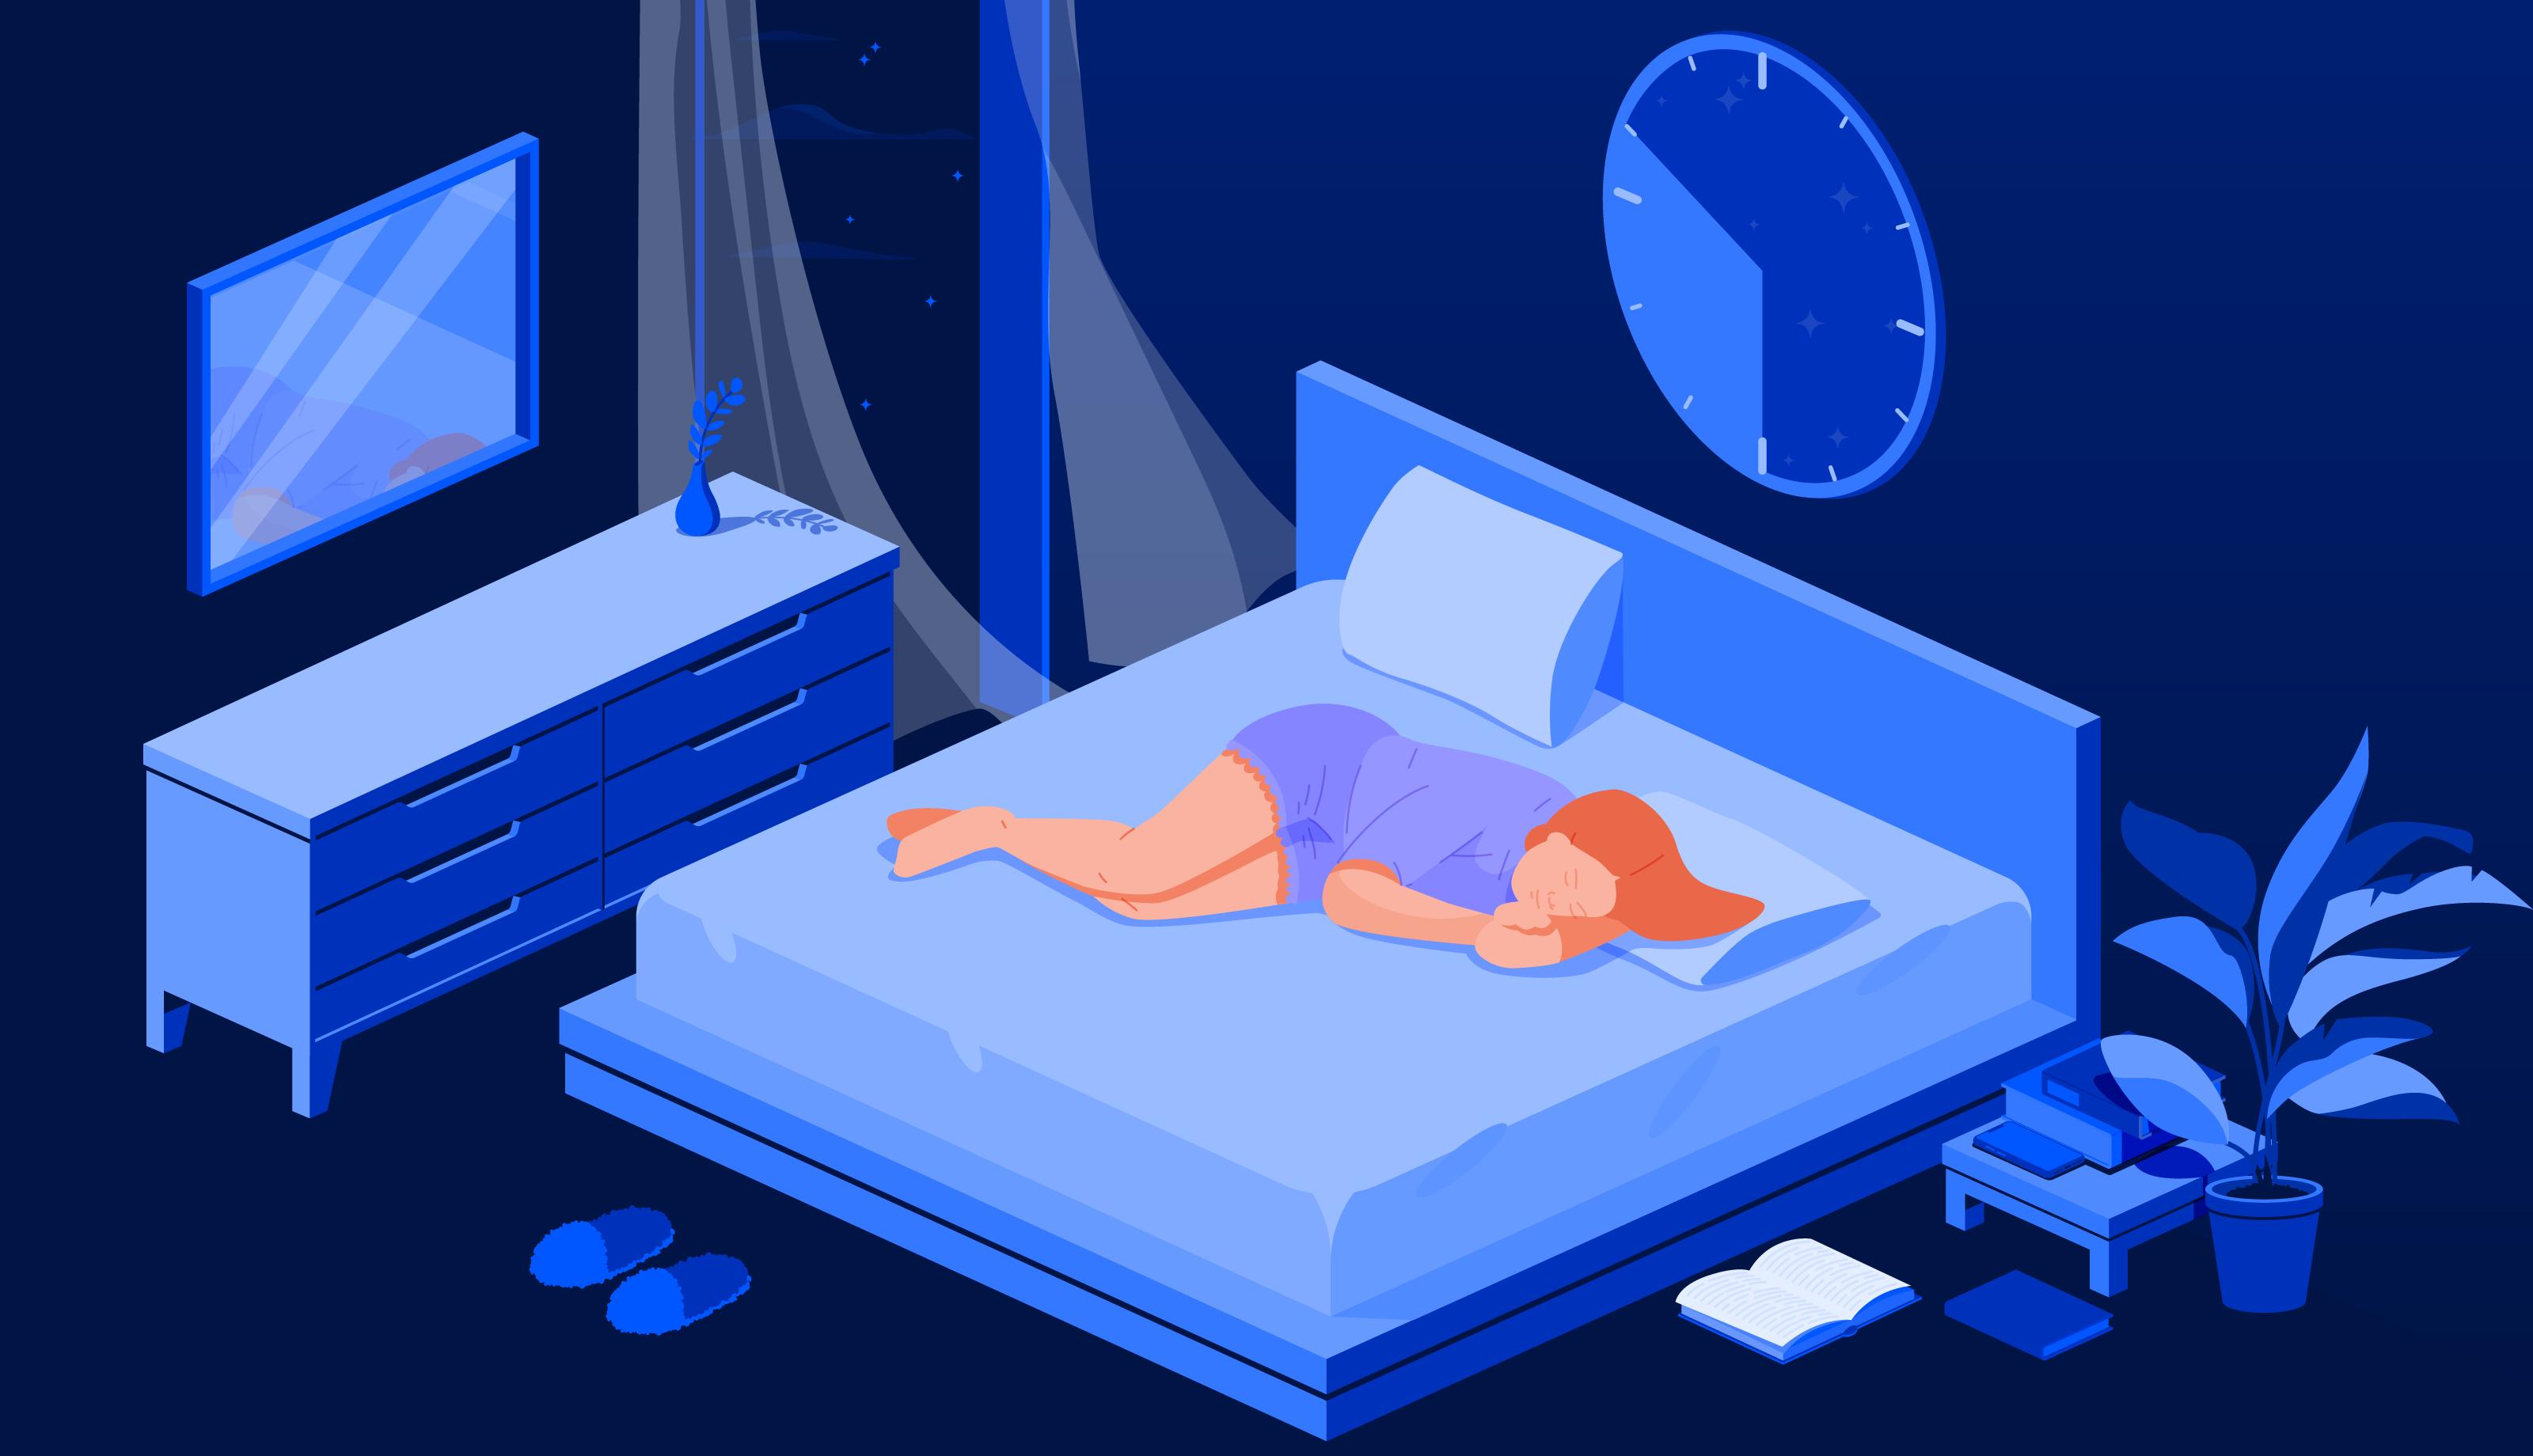 2020-07-27-How-to-biohack-sleep